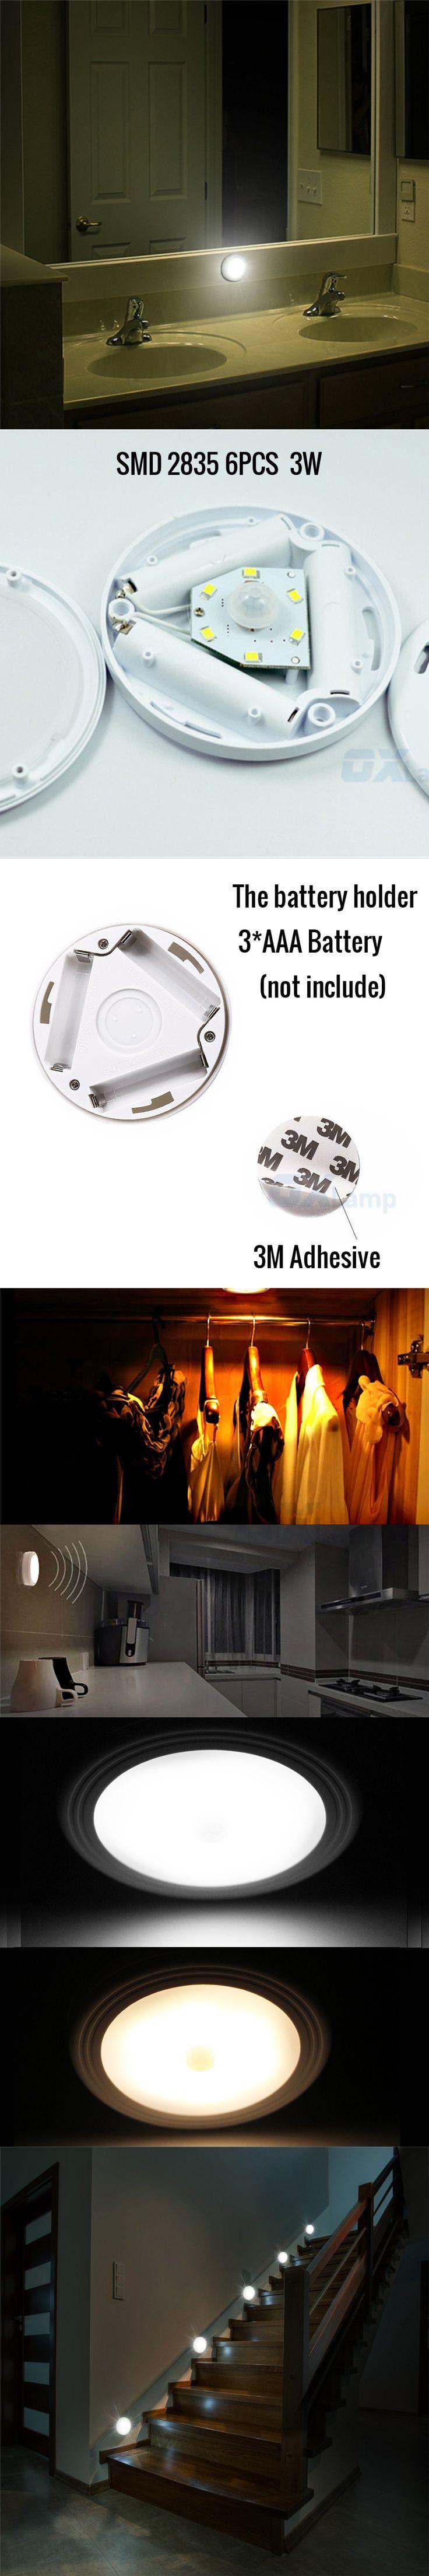 PIR Motion Sensor 6 LED Night Light Wireless Battery Activated Detector Closet Lights Hallway Bedroom Kitchen Wall Ceiling Lamp